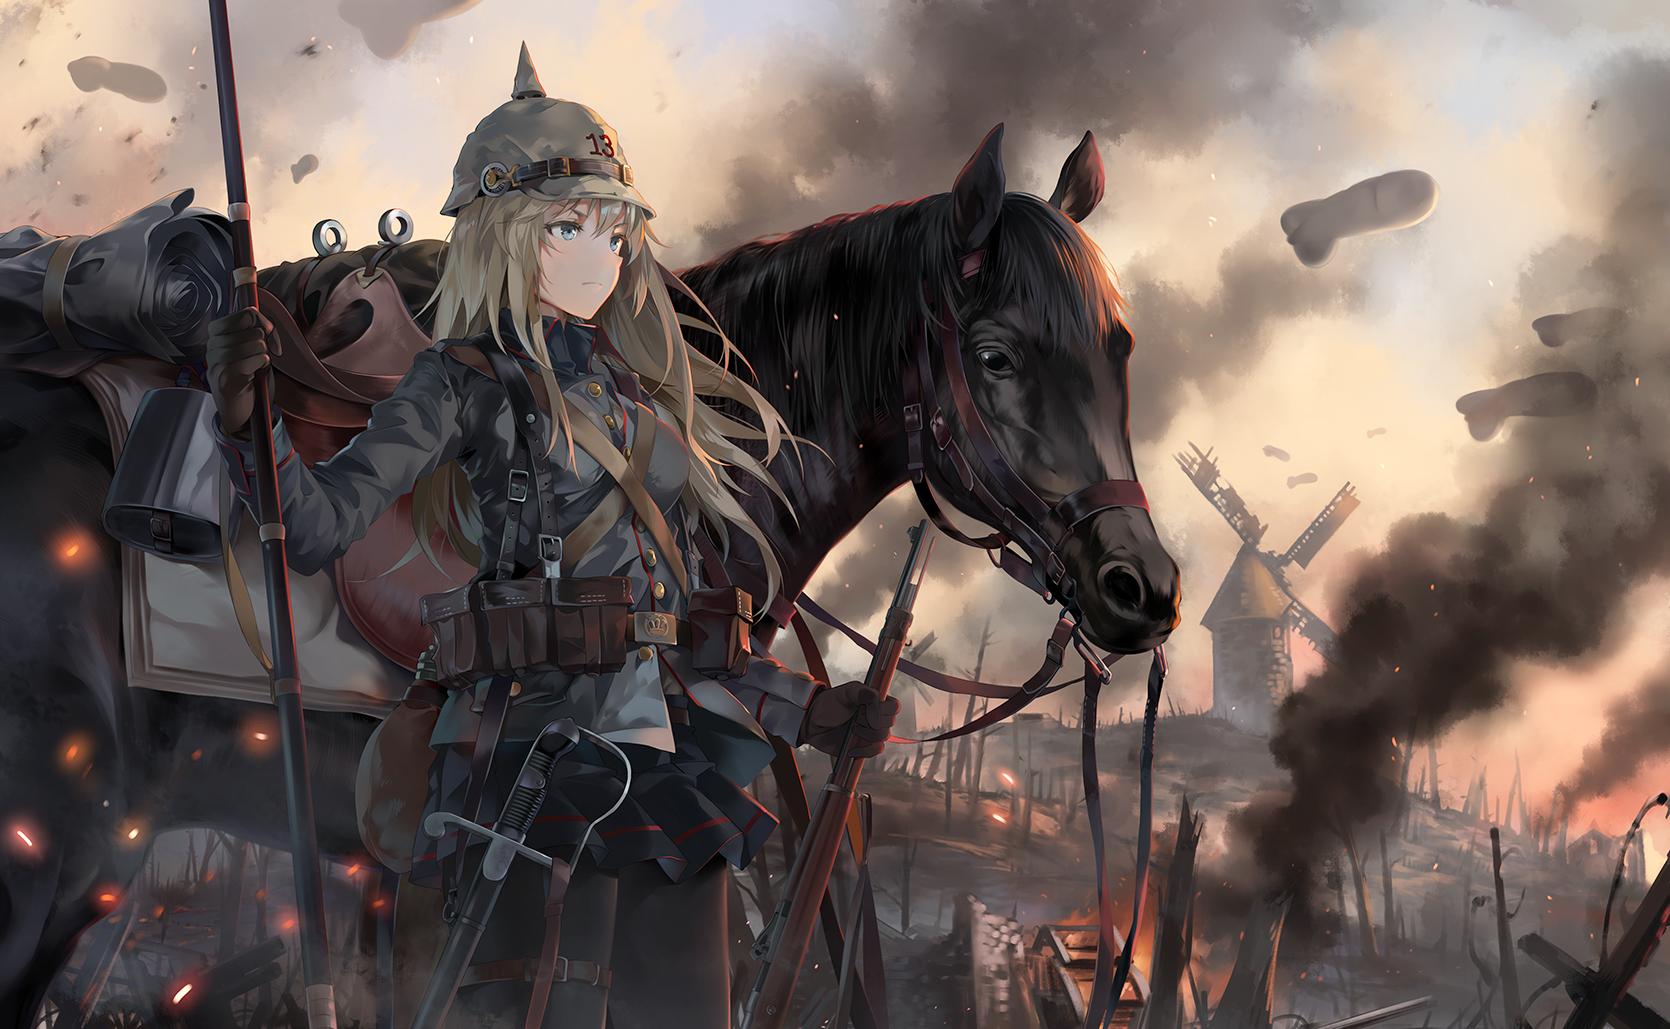 Wallpaper anime girls original characters neko - Anime war wallpaper ...